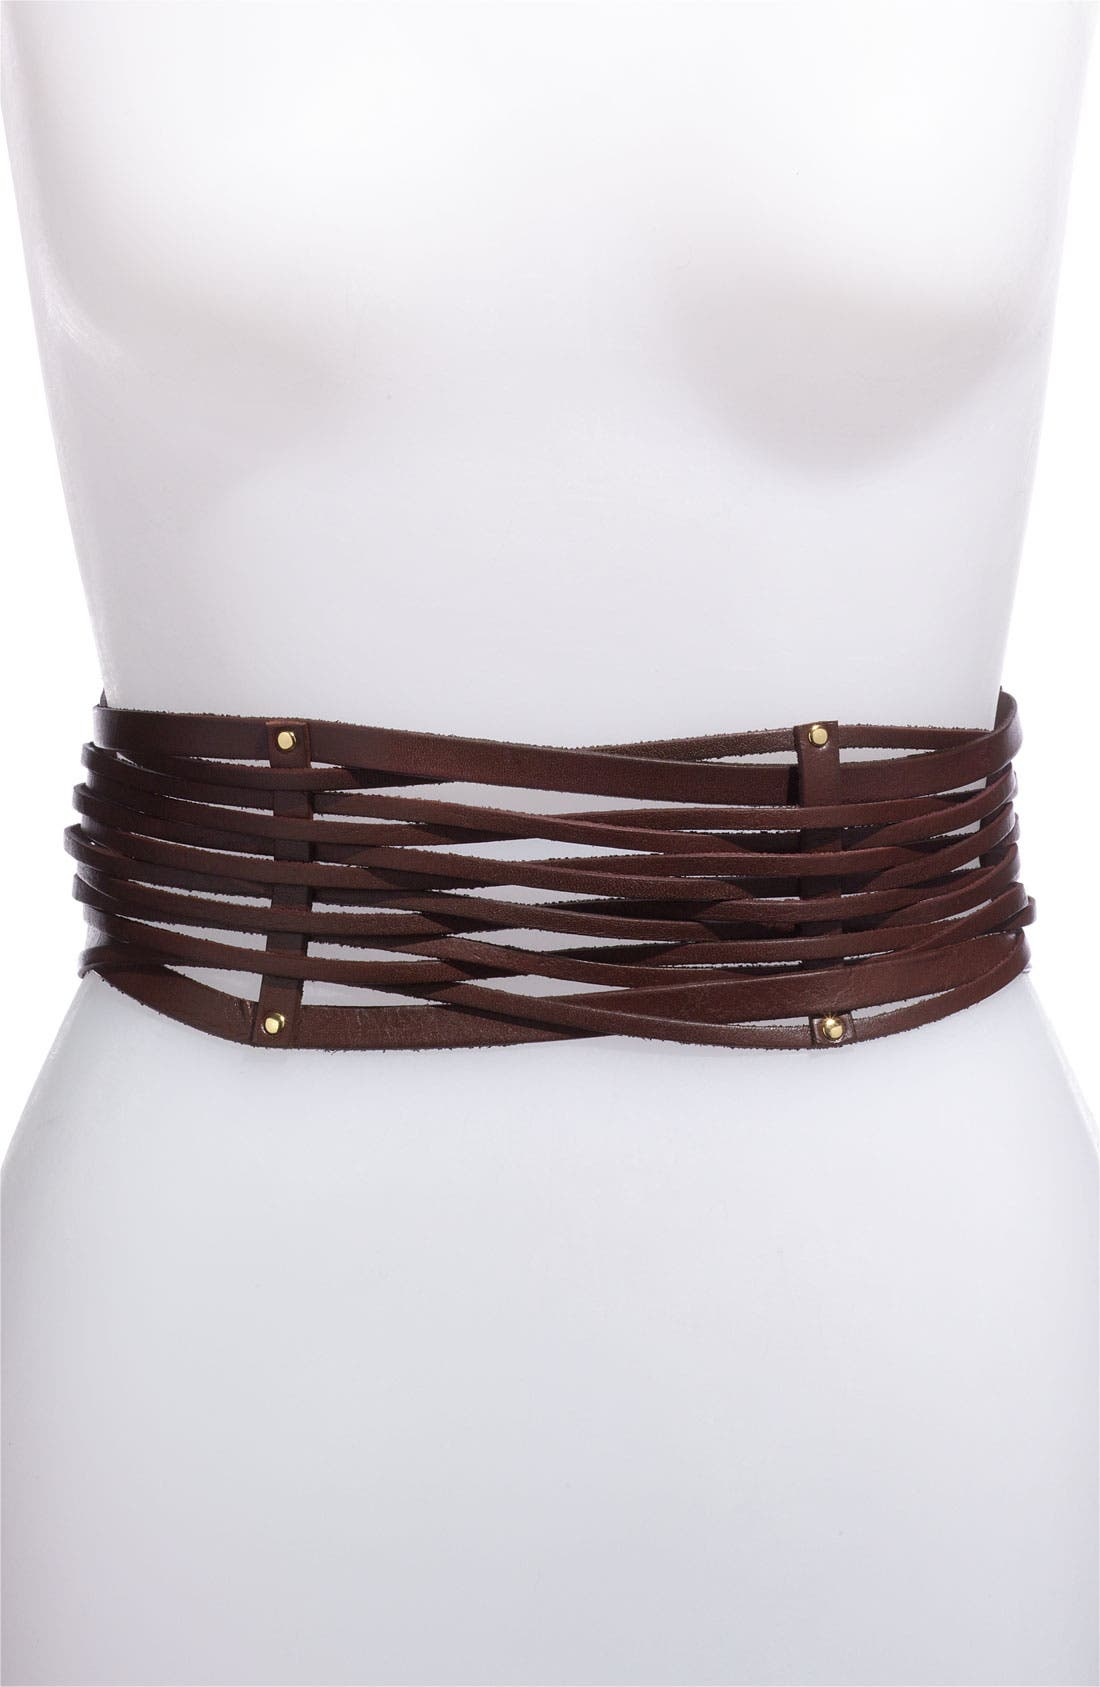 Main Image - Vince Camuto Leather Strand Stretch Belt